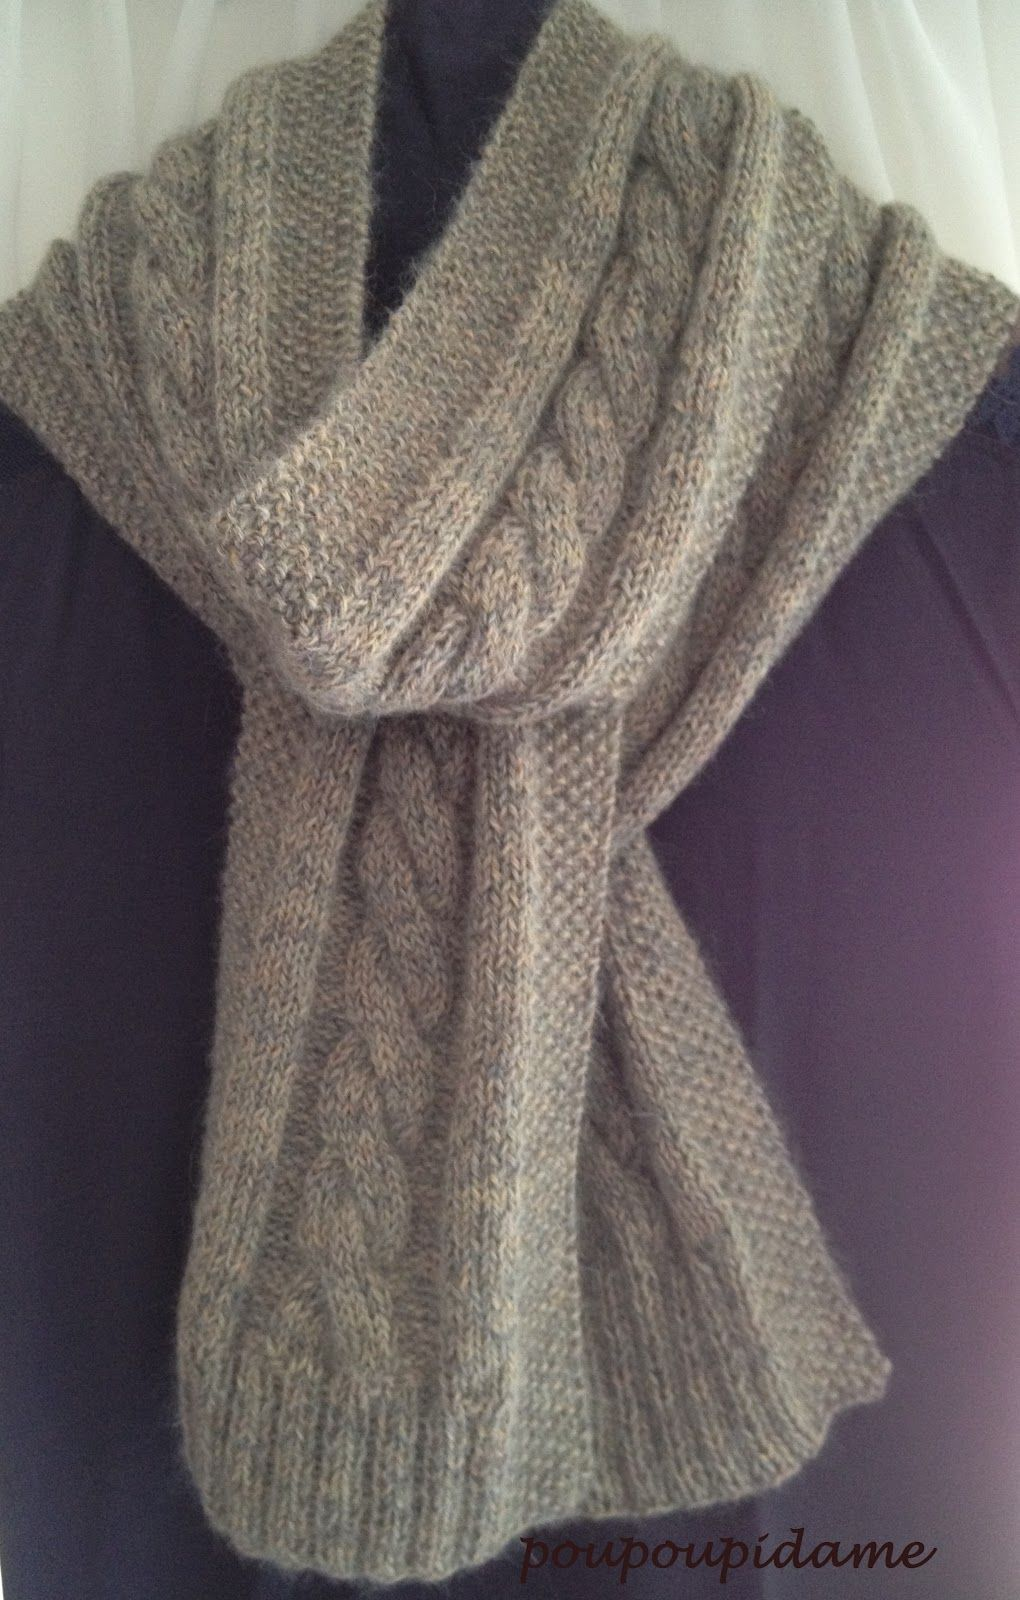 Modele echarpe tricot torsade   echarpe   Knitting, Tricot et Crochet ea401575b0f